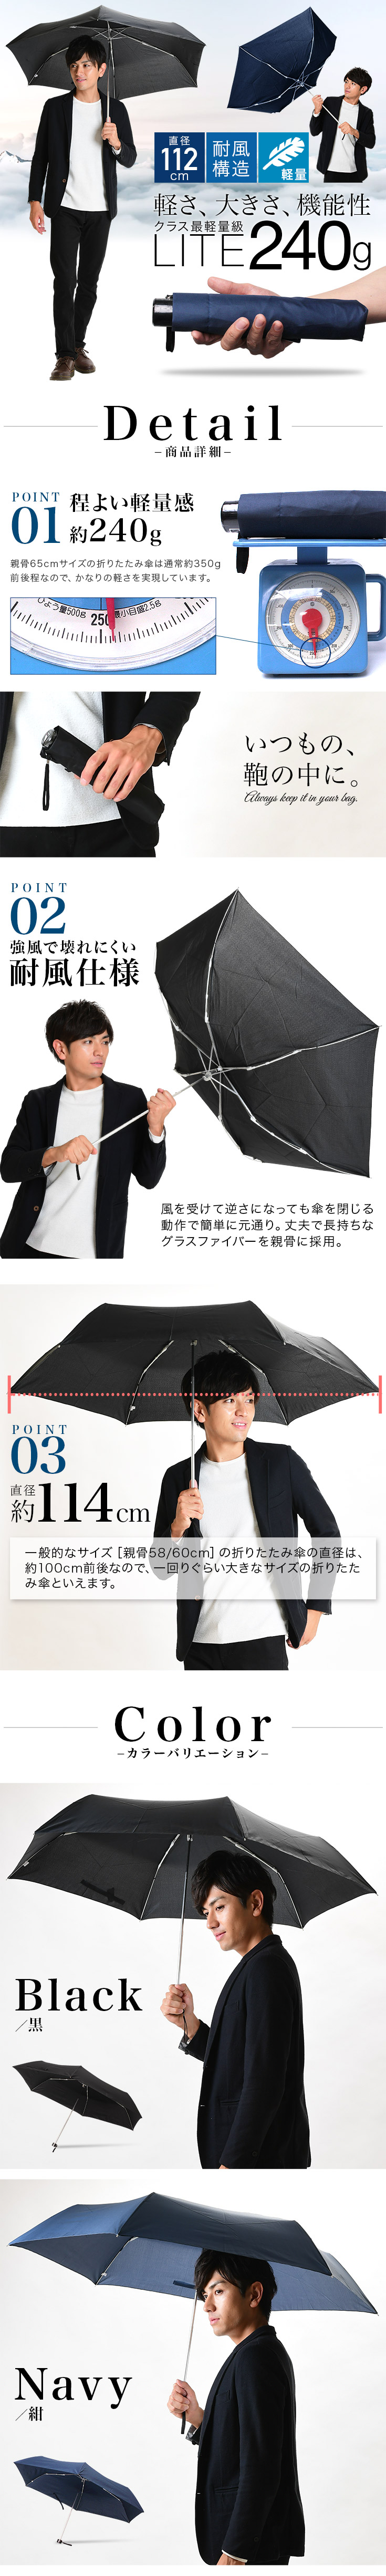 65cm軽量耐風折りたたみ傘